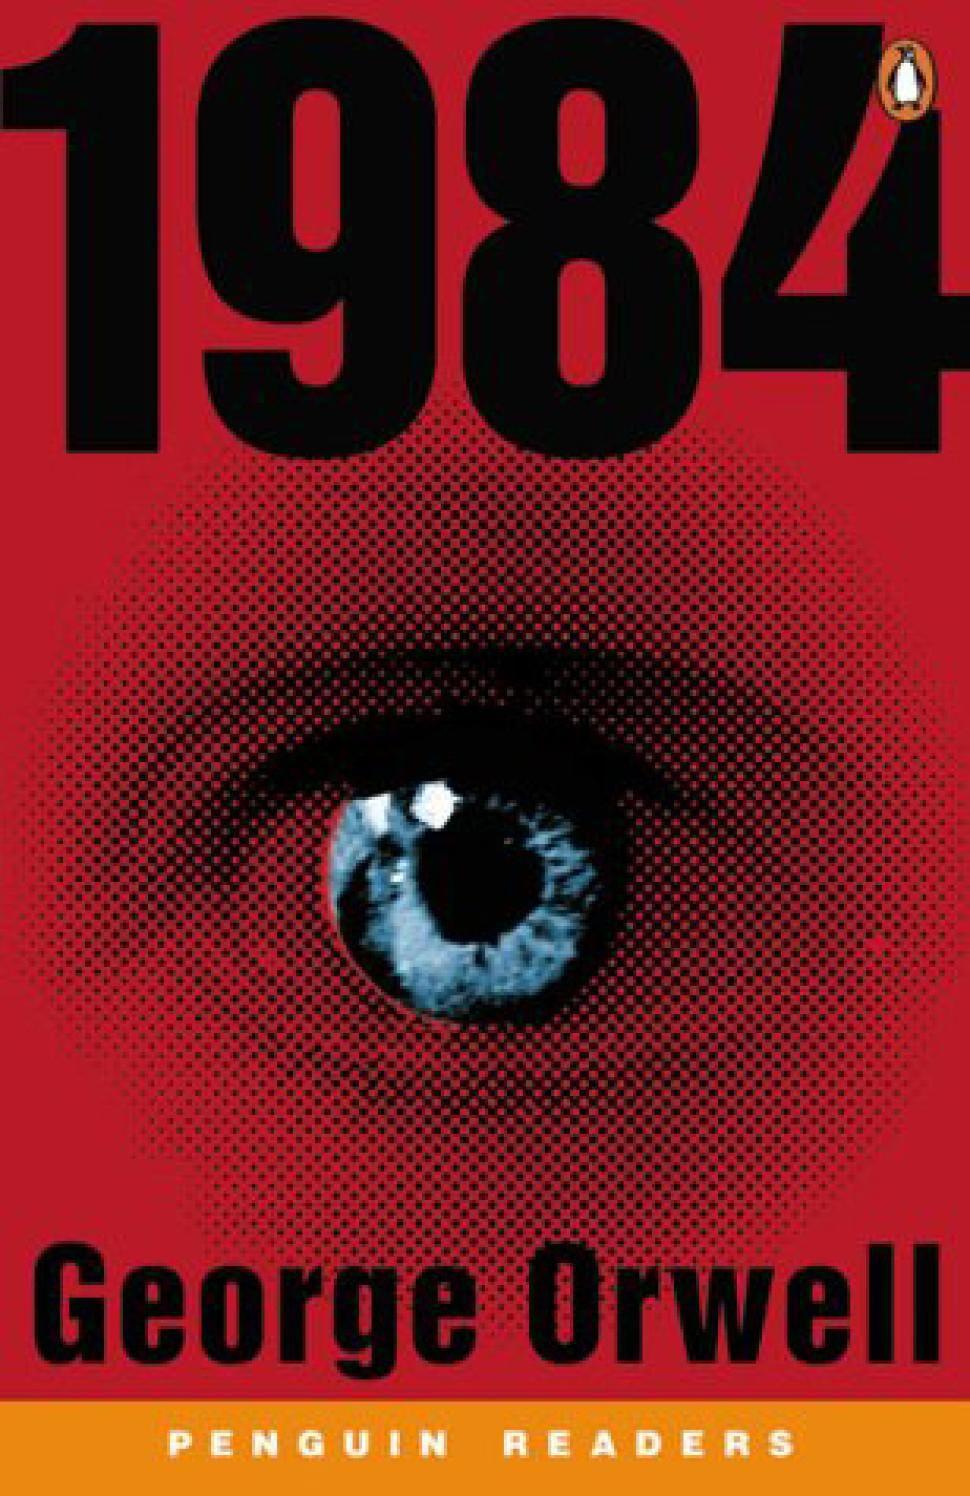 1984 george orwell online book free